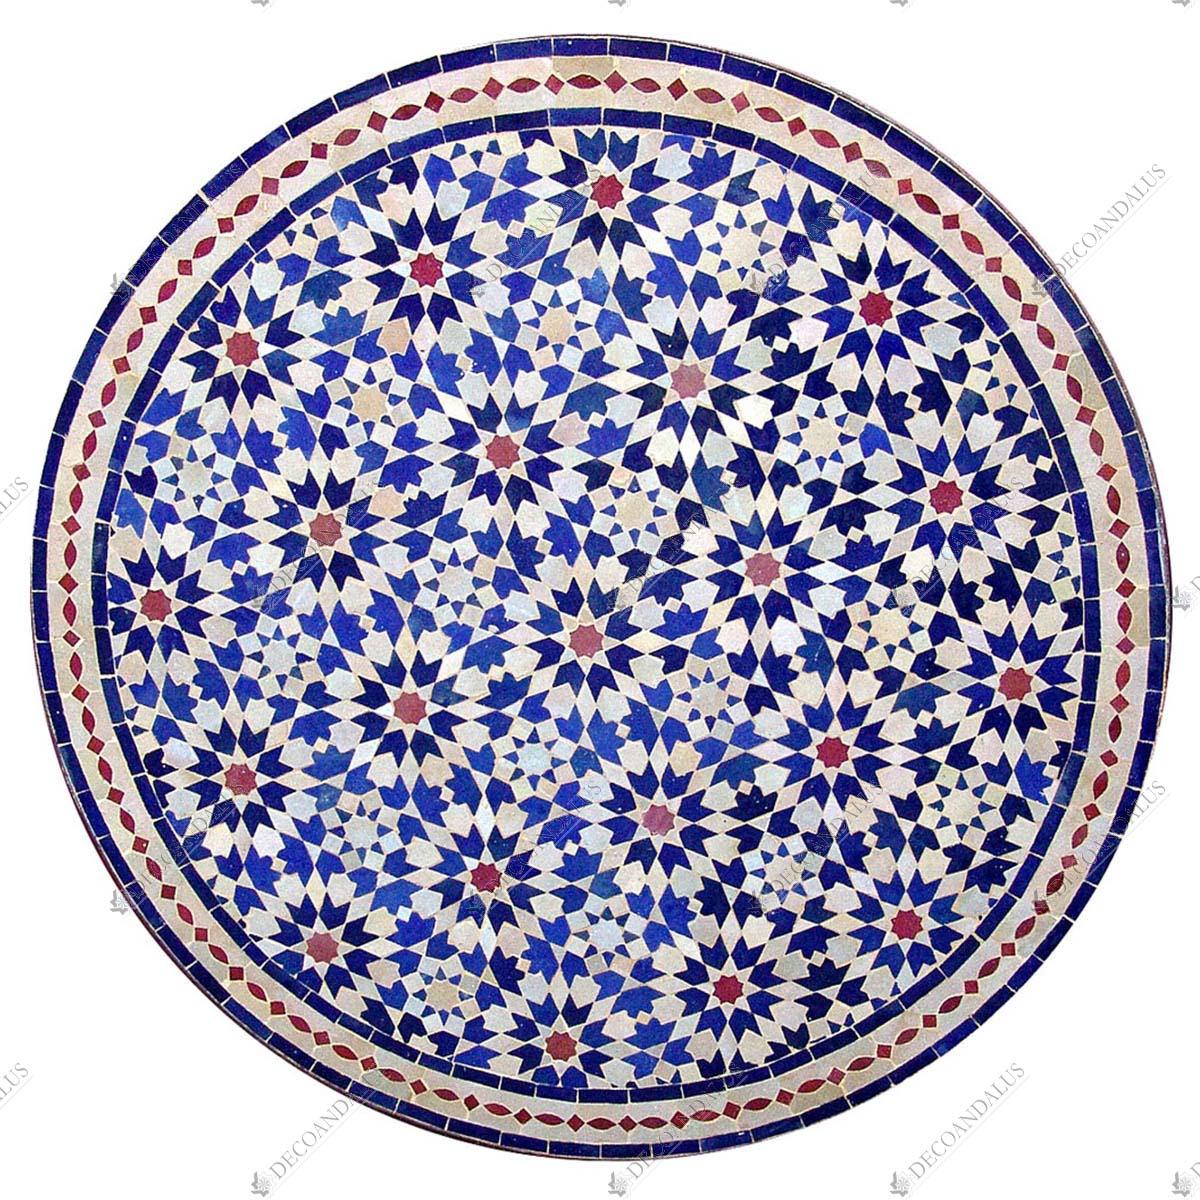 Mosaico cer mica decoraci n exterior decoandalus for Mosaico ceramica